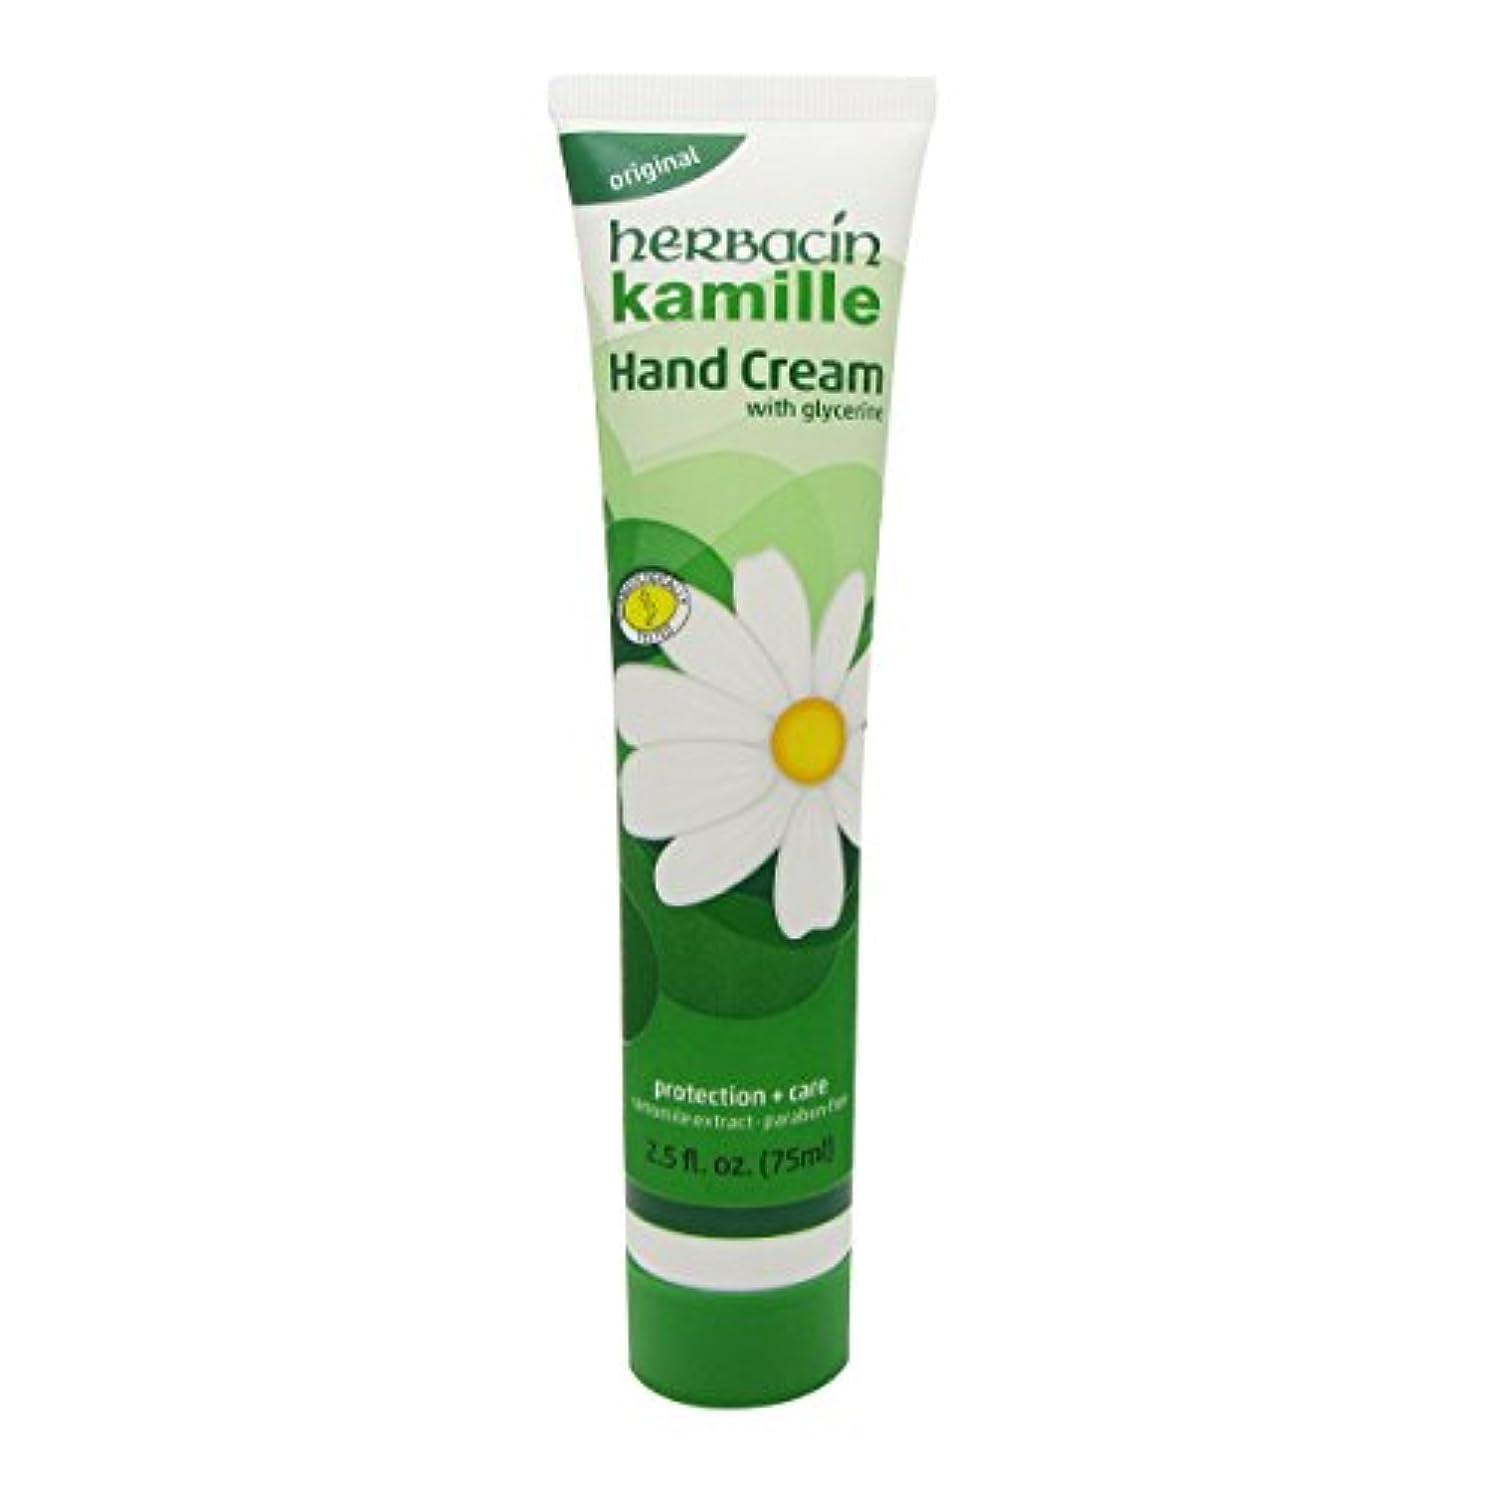 偽物機密格差Herbacin Wuta Kamille Hand Cream Tubo 75ml [並行輸入品]